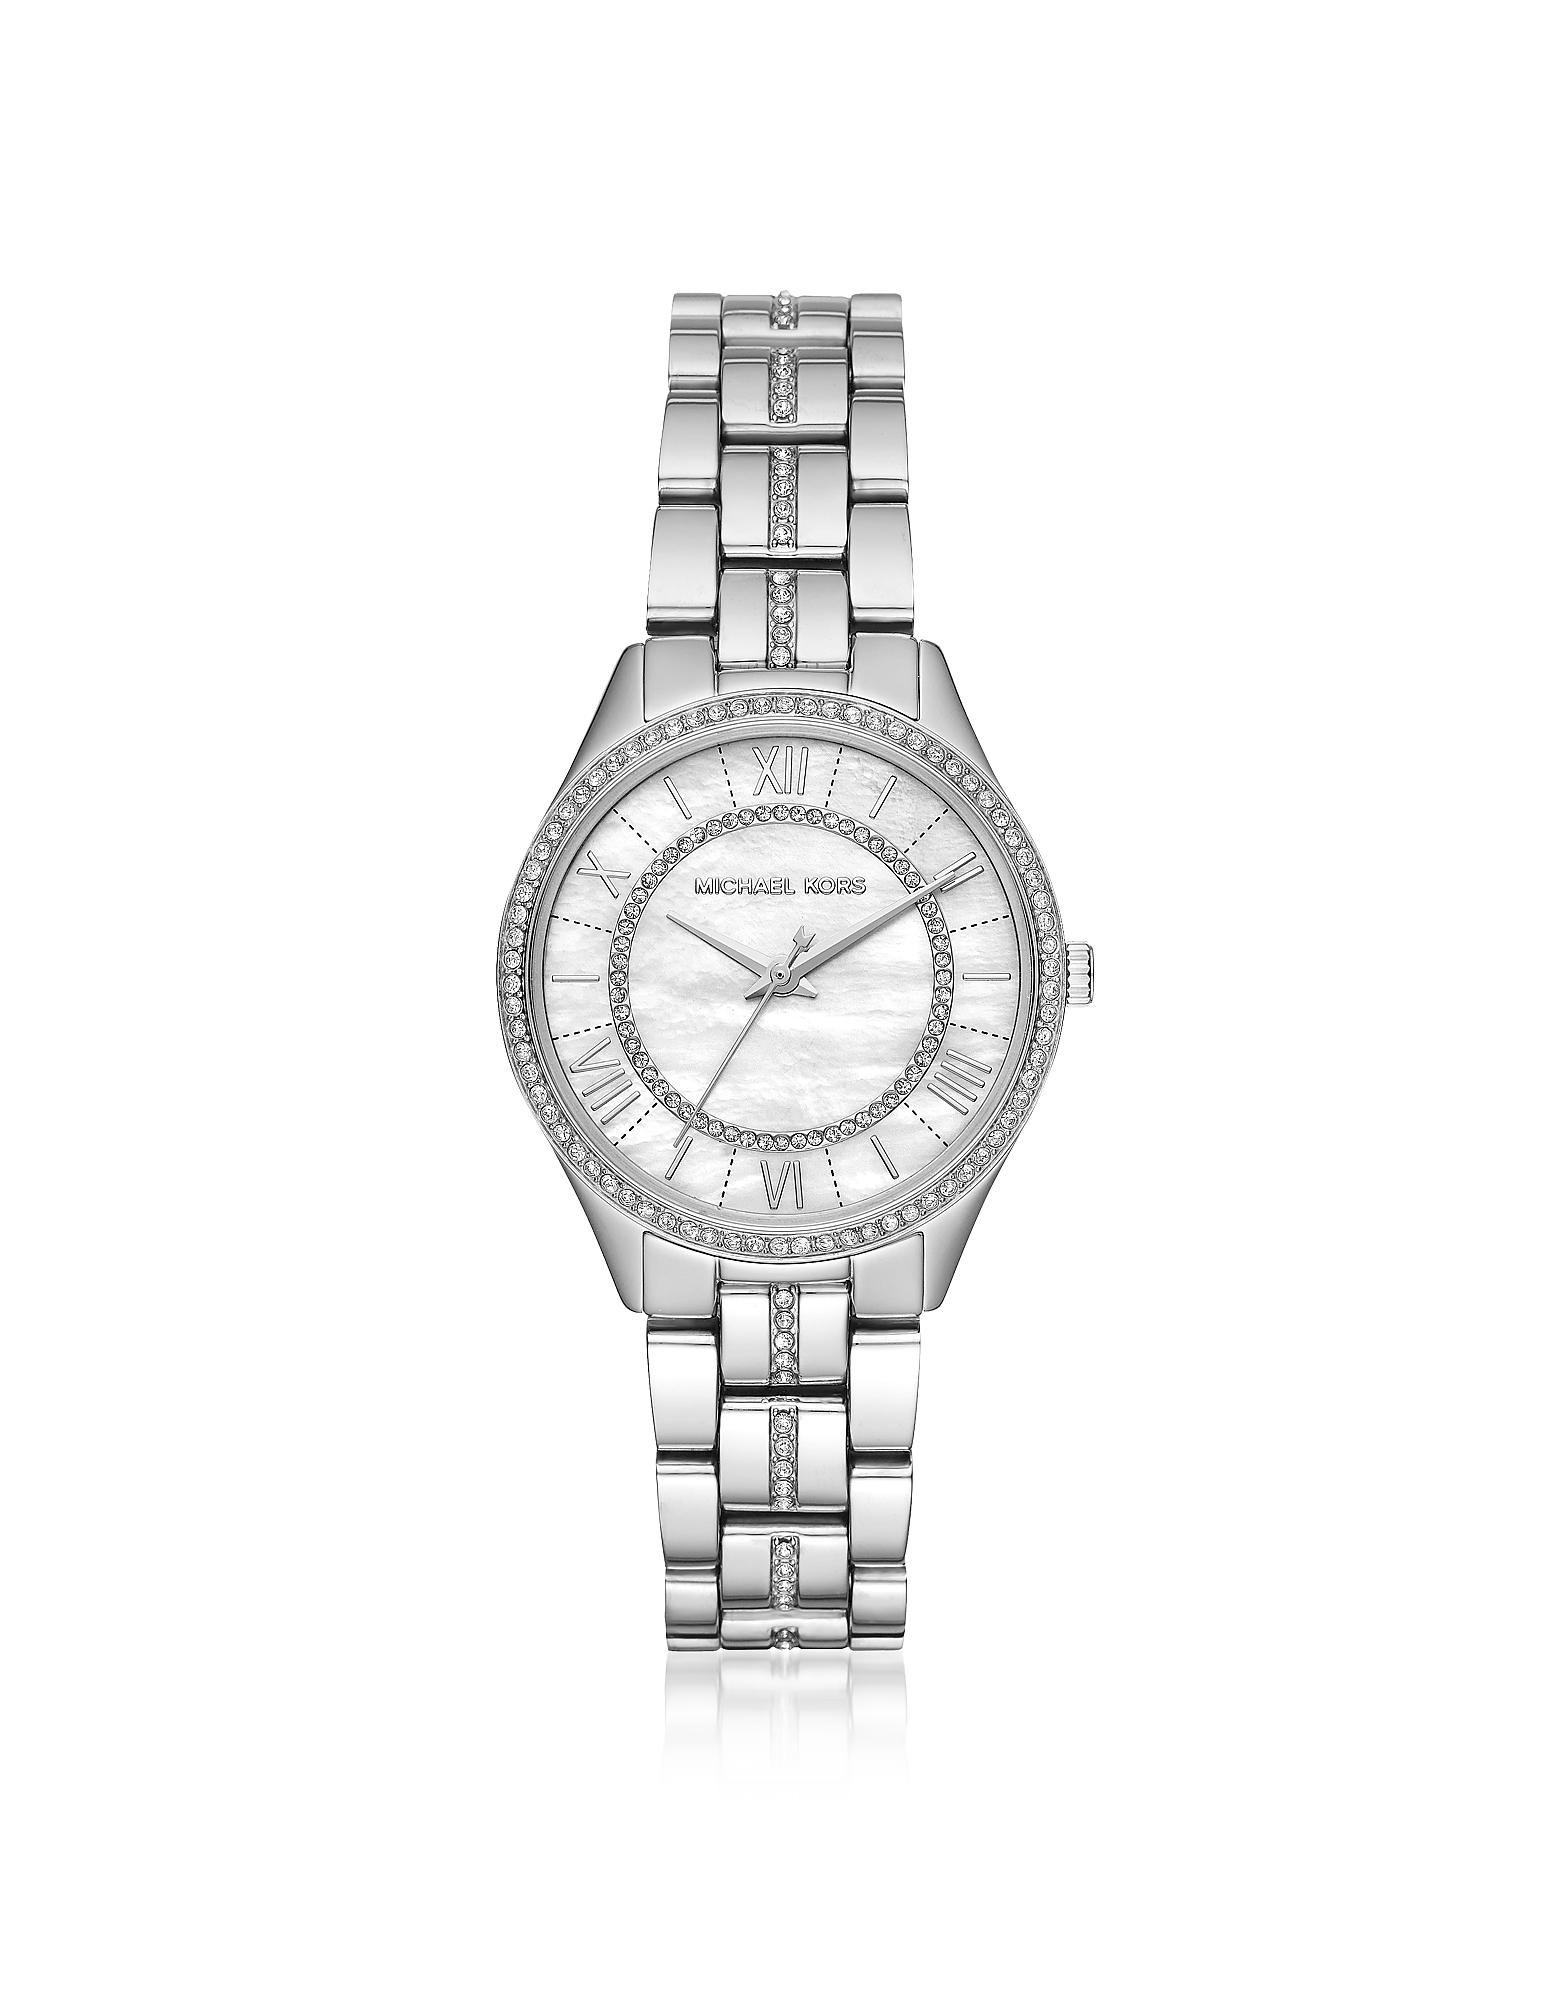 Michael Kors Women's Watches, Mini Lauryn Pavé Silver Tone Women's Watch